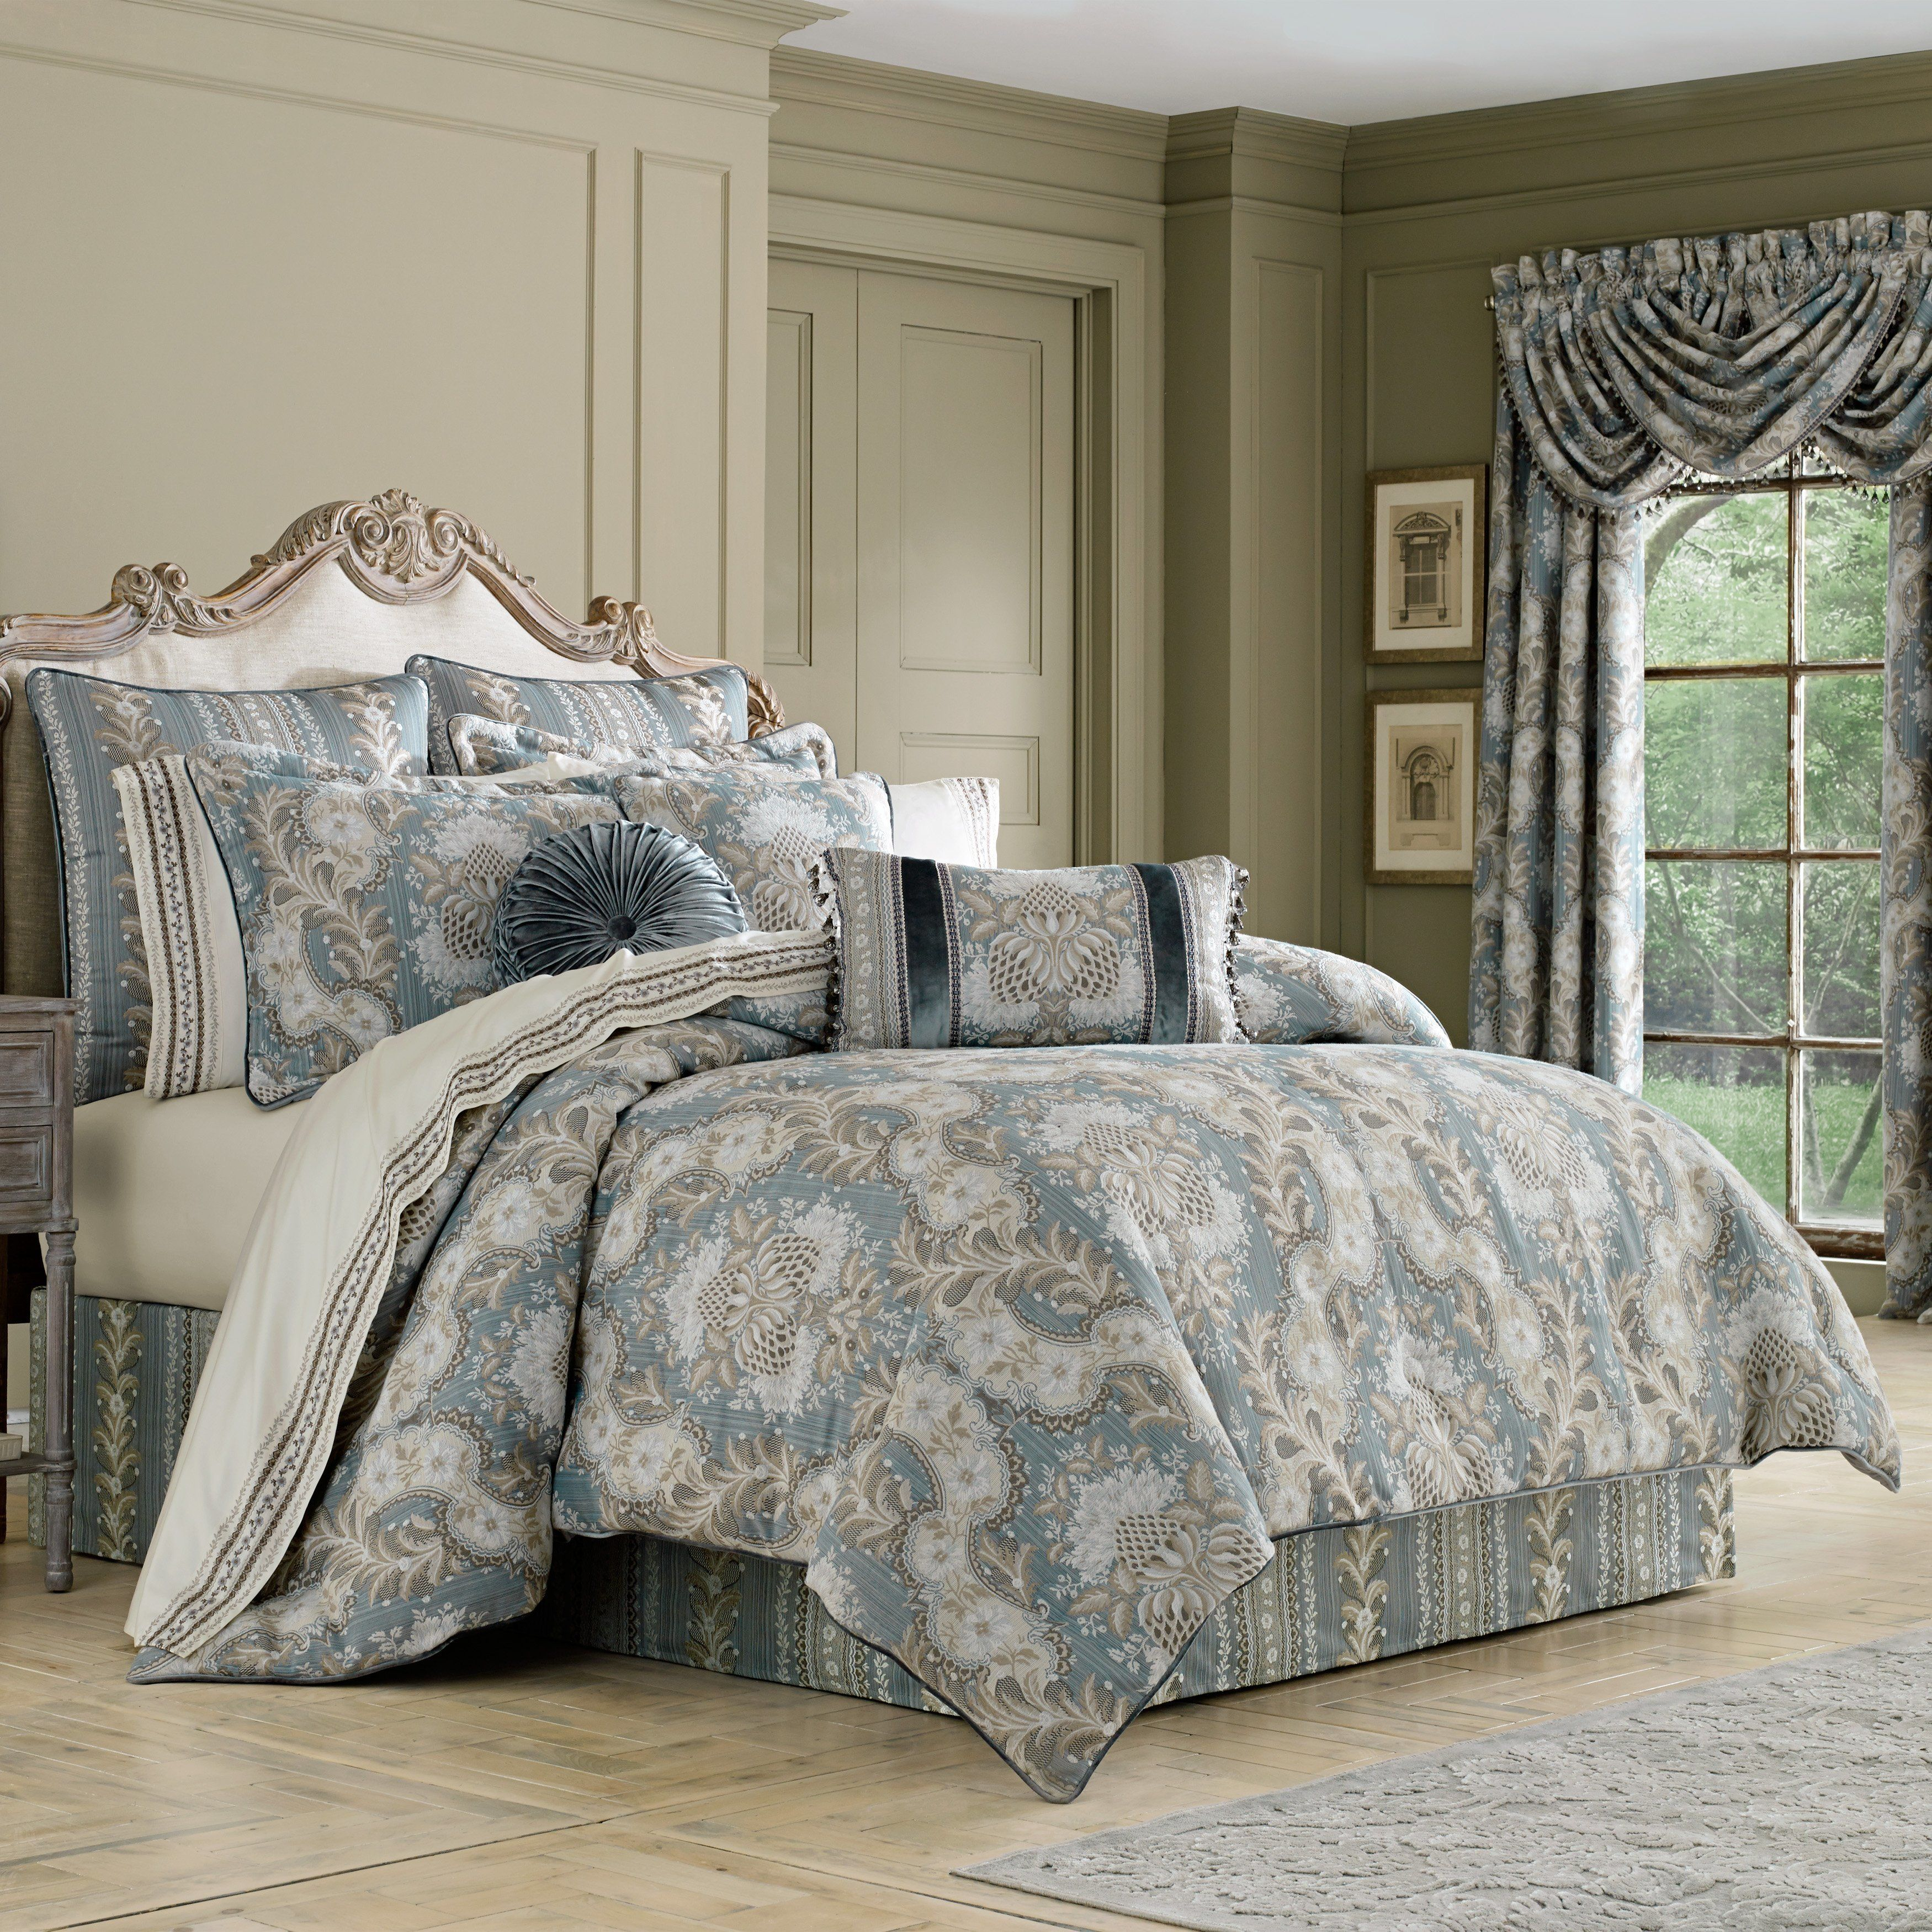 Crystal Palace French Blue 4 Piece Comforter Set In 2020 King Comforter Sets Comforter Sets Queen Comforter Sets